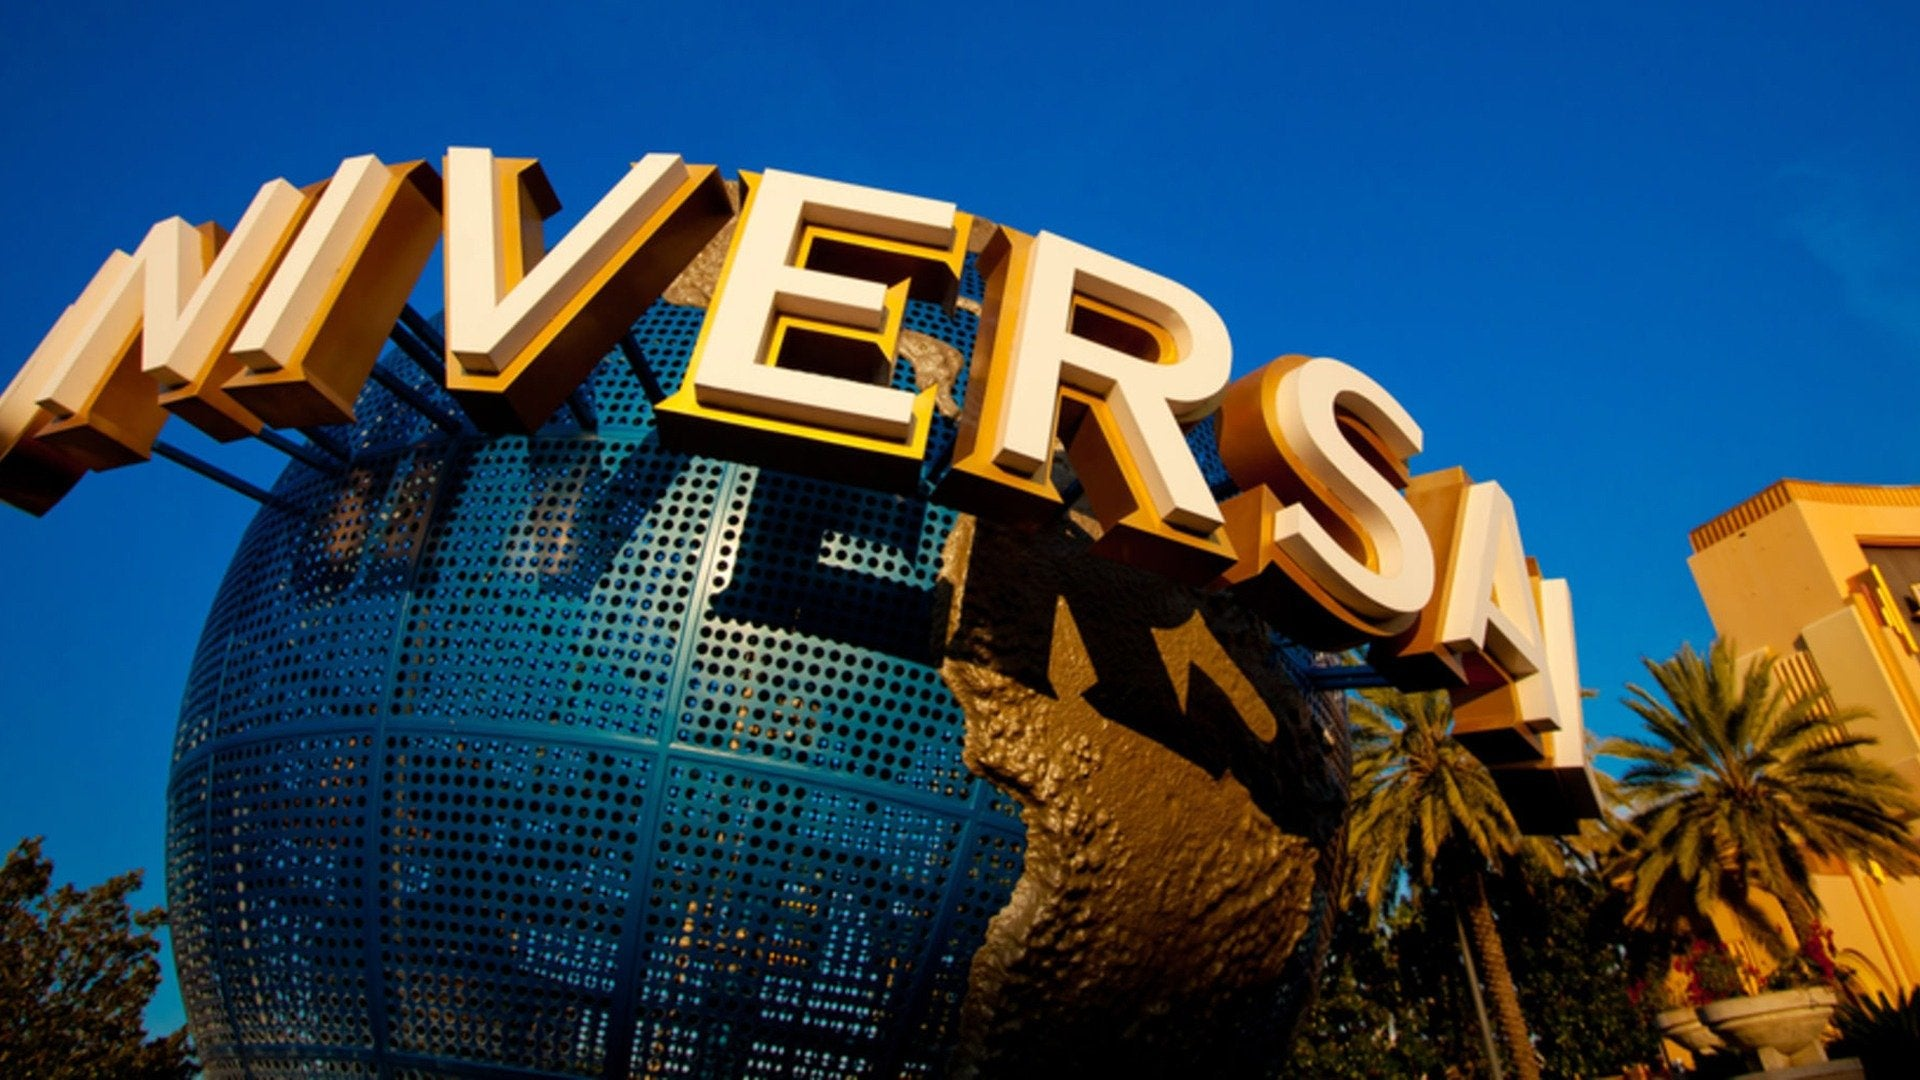 Universal Orlando: Behind the Scenes